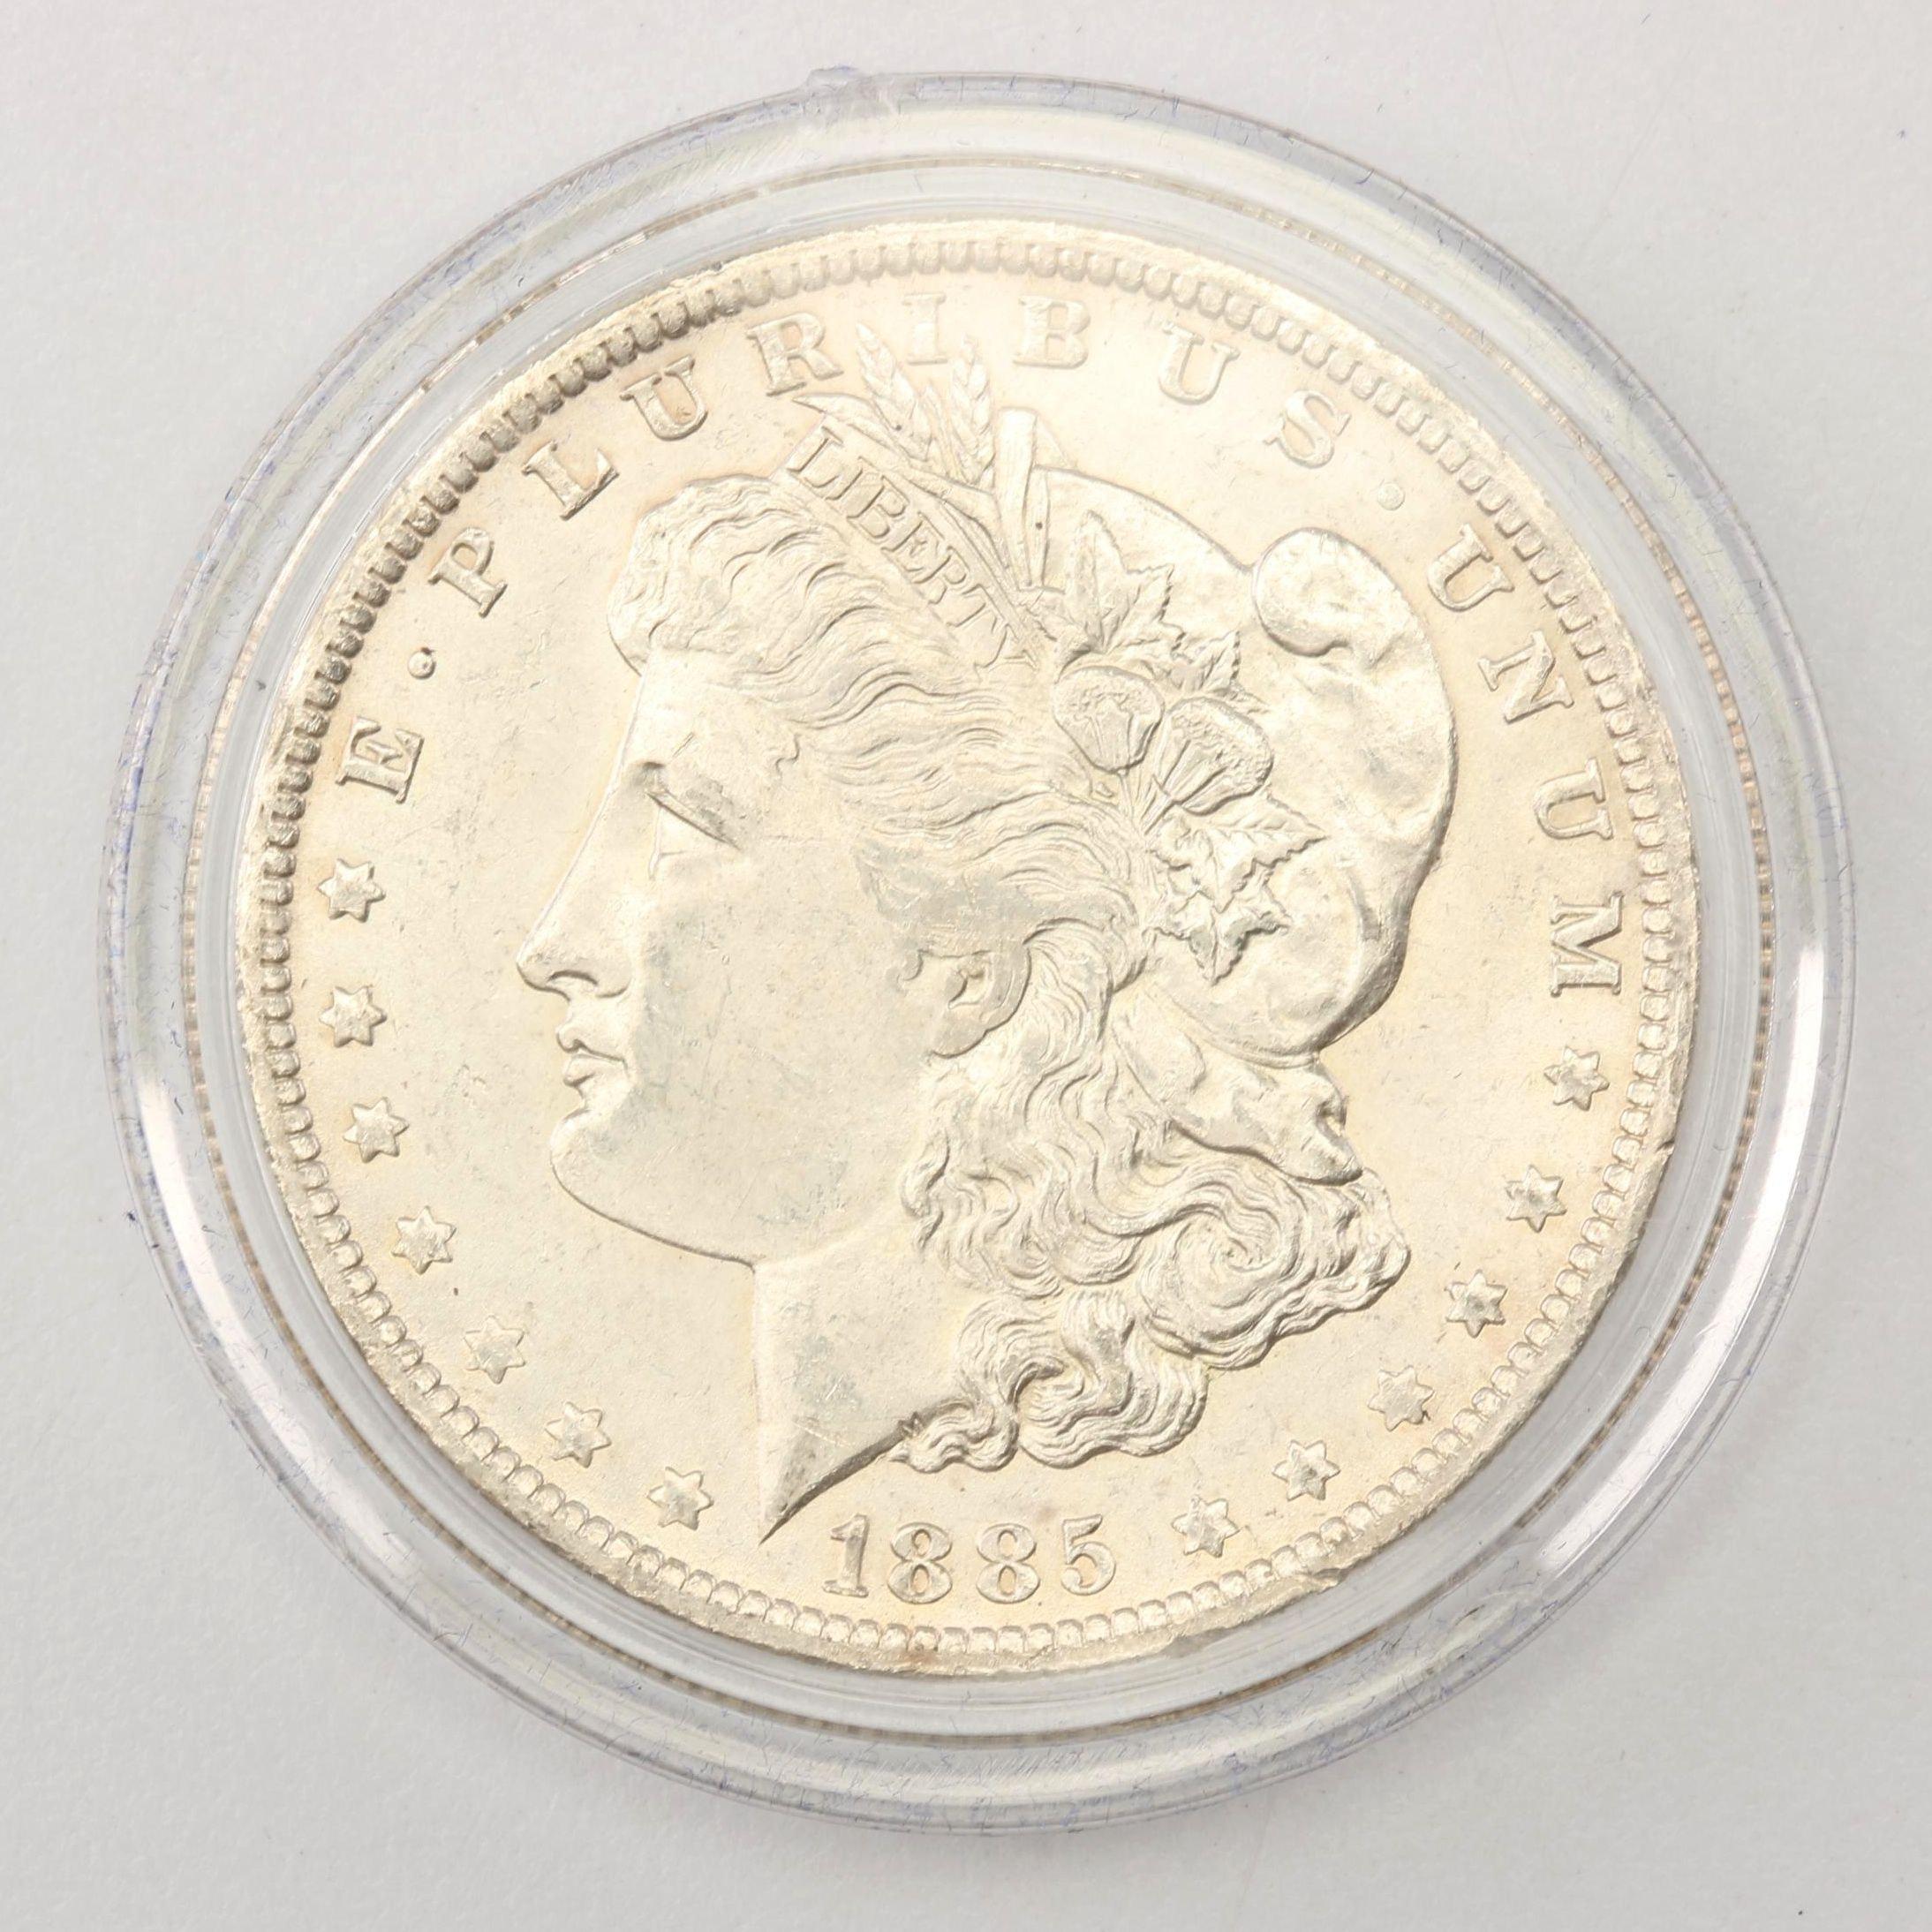 1885-O Morgan Silver Dollar in Display Case